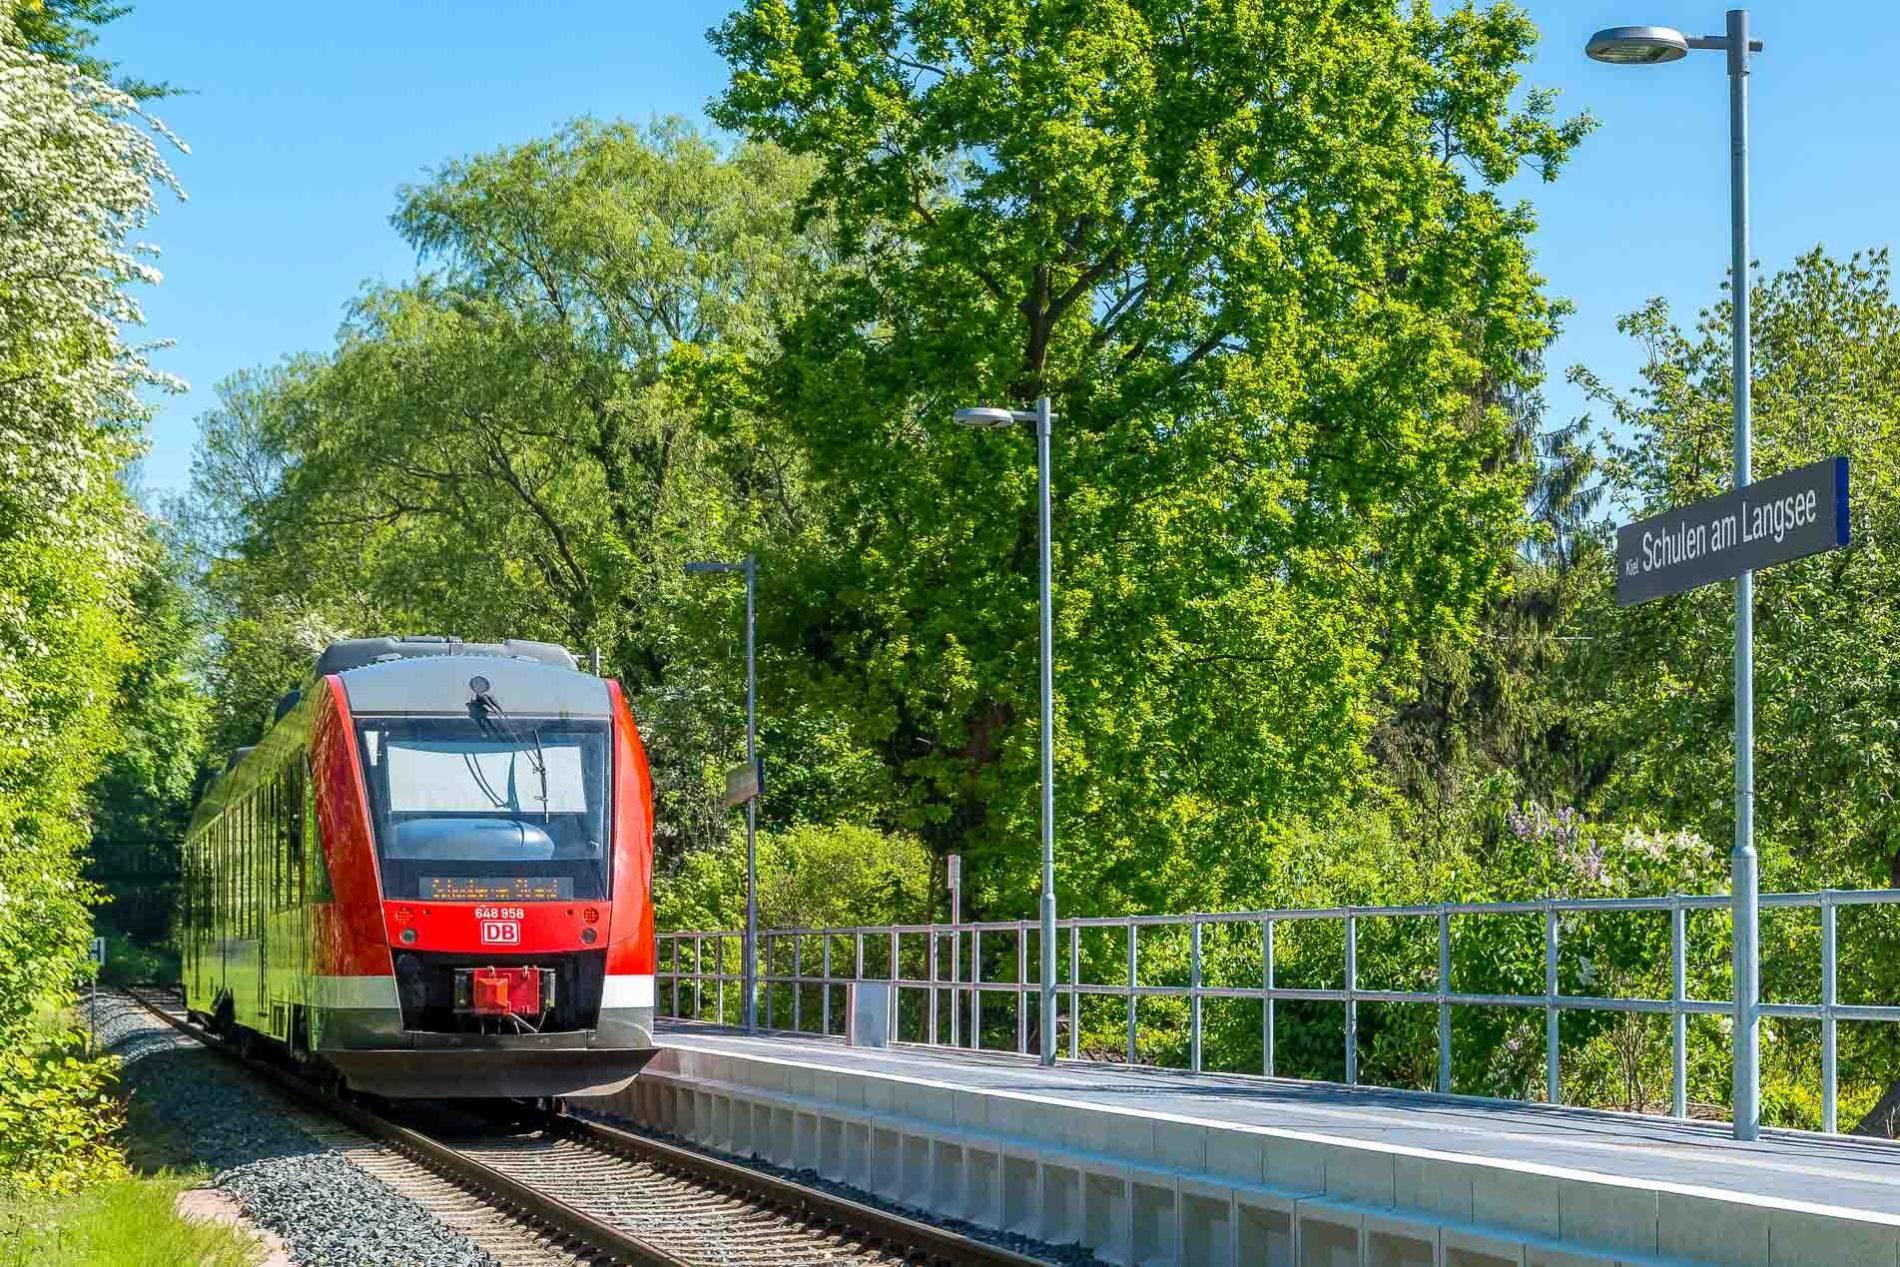 "Sonderzug am Haltepunkt ""Schulen am Langsee"" in Kiel."